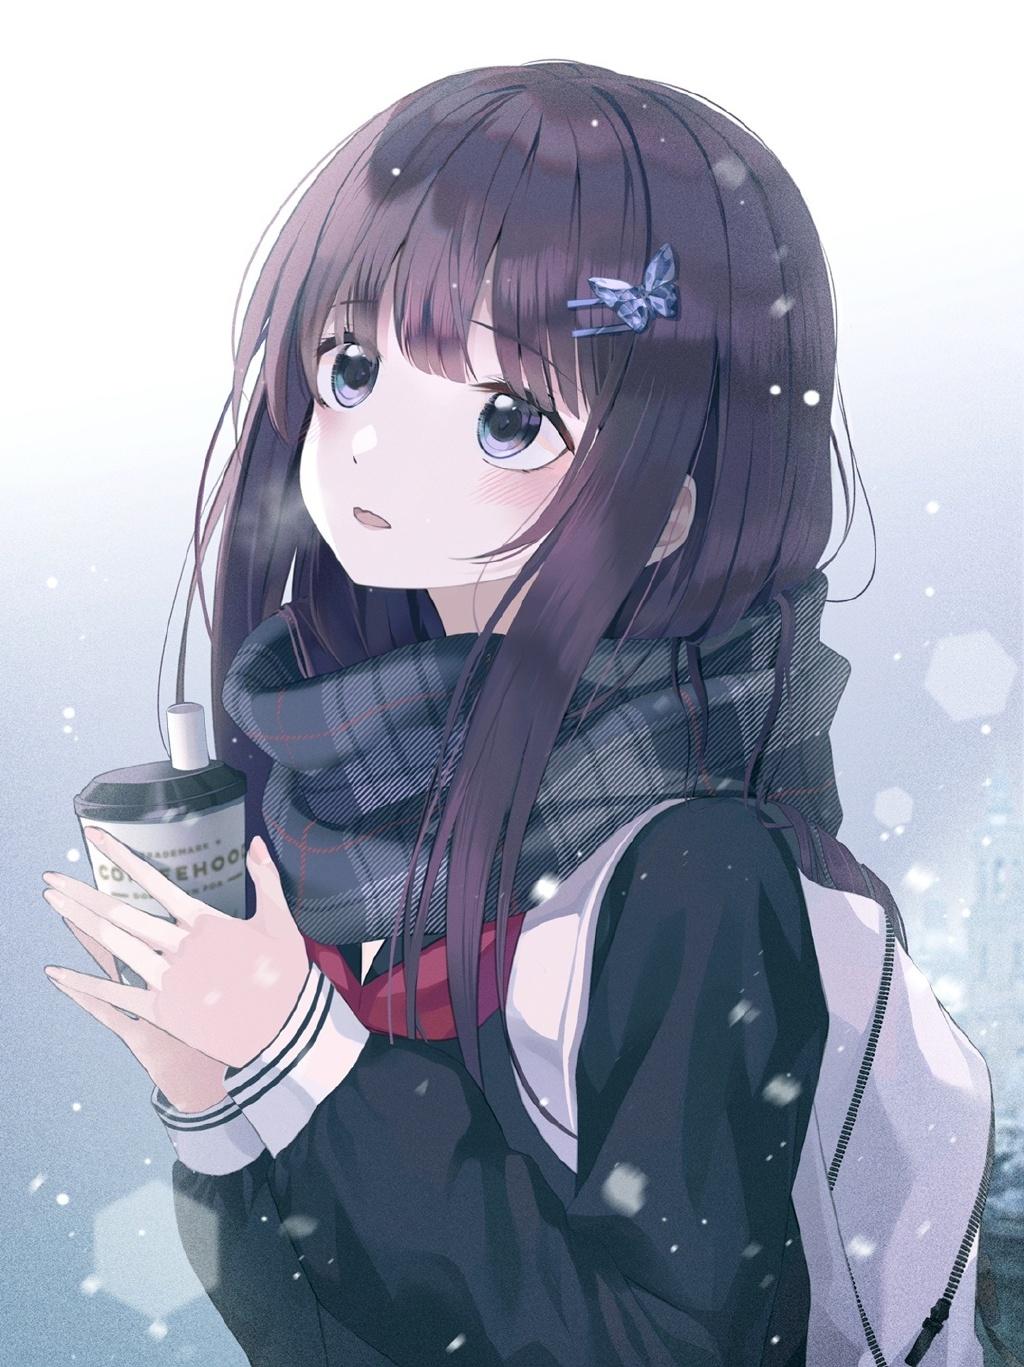 【P站画师】各种可爱的美少女!韩国画师KANZI的插画作品- ACG17.COM